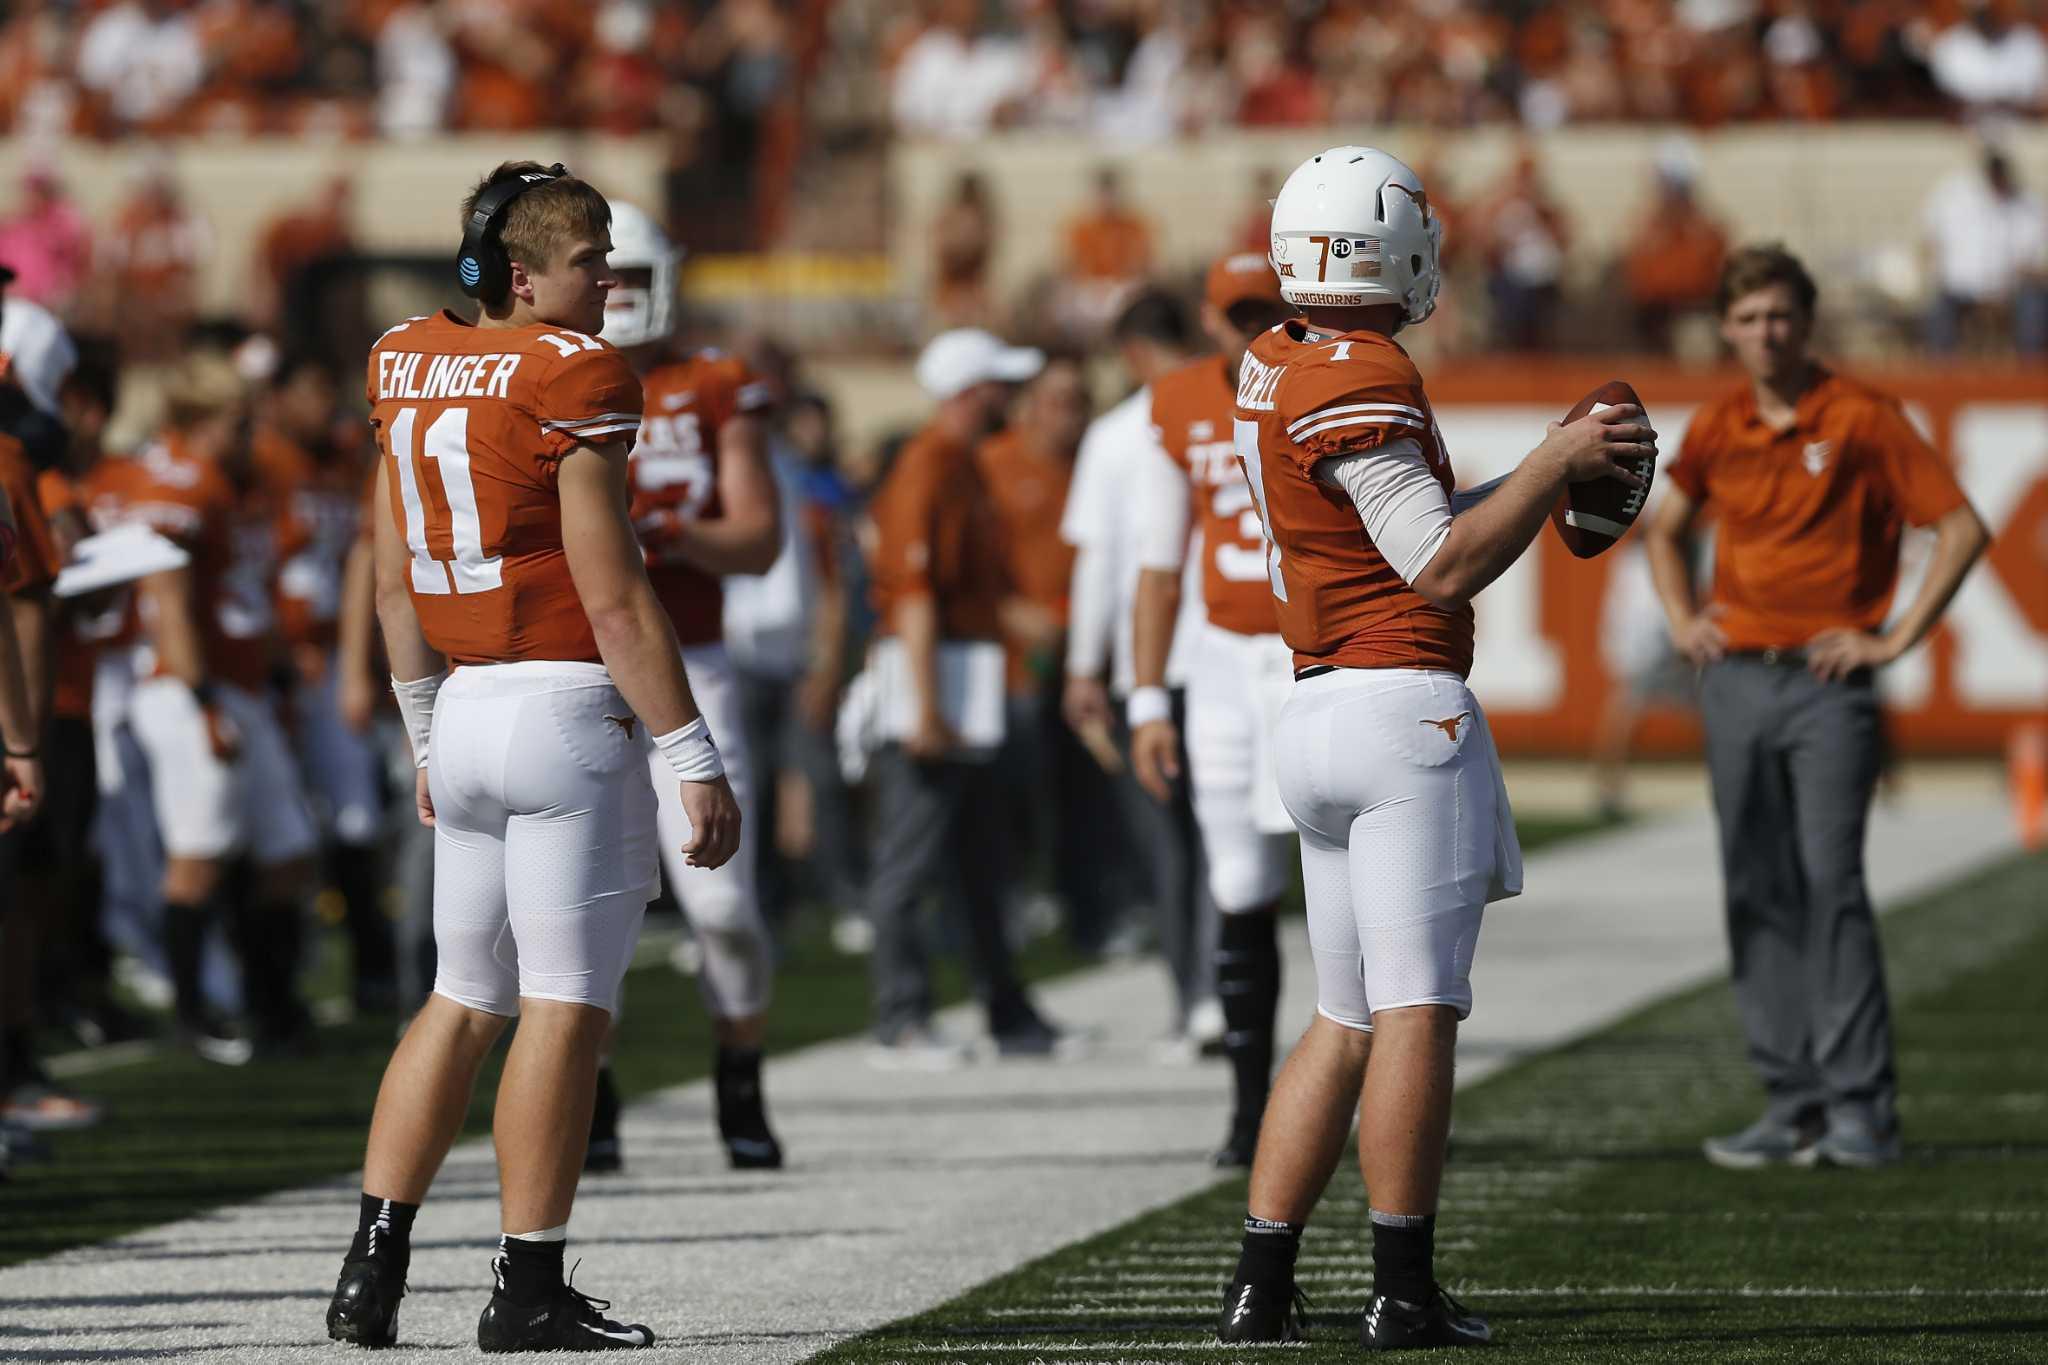 Mri Reveals Shoulder Sprain For Texas Qb Sam Ehlinger